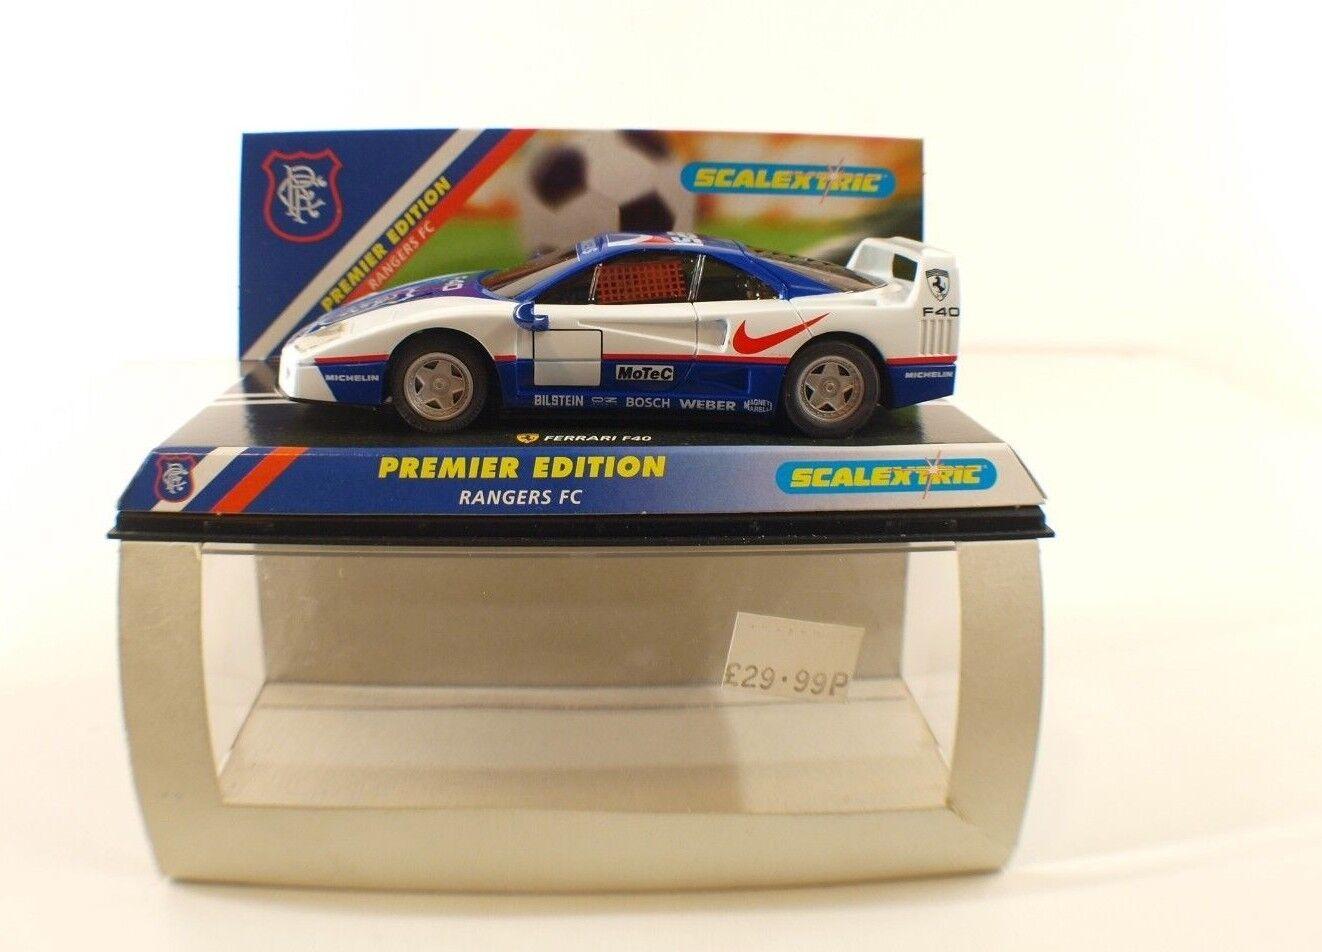 Scalextric 2148 super edition ferrari f40 rangers fc slot car 1 32 mint